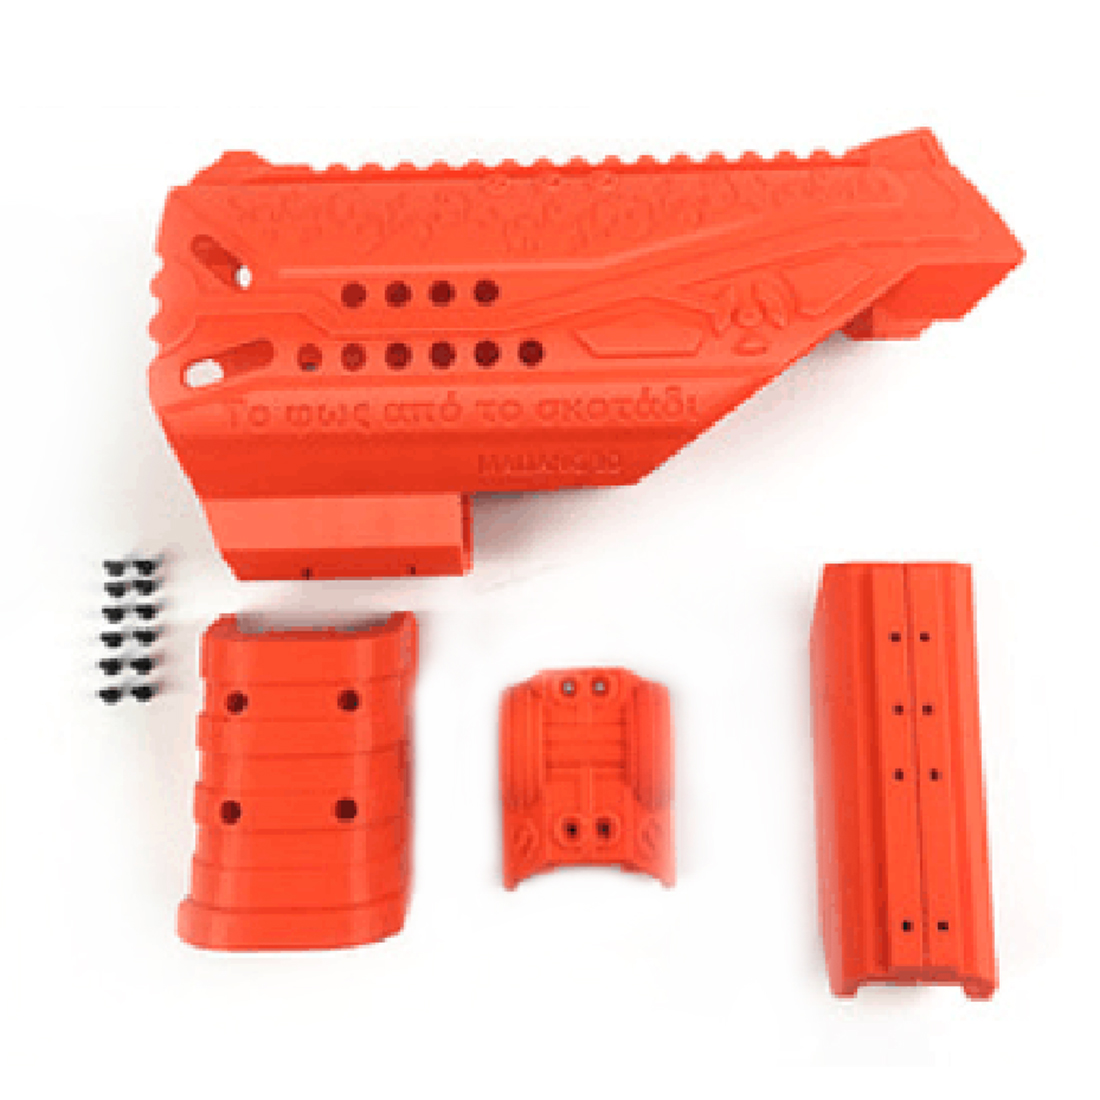 купить Surwish Maliang 3D Printing Modified Kit for Nerf N-Strike Elite Strongarm Blaster по цене 5735.59 рублей